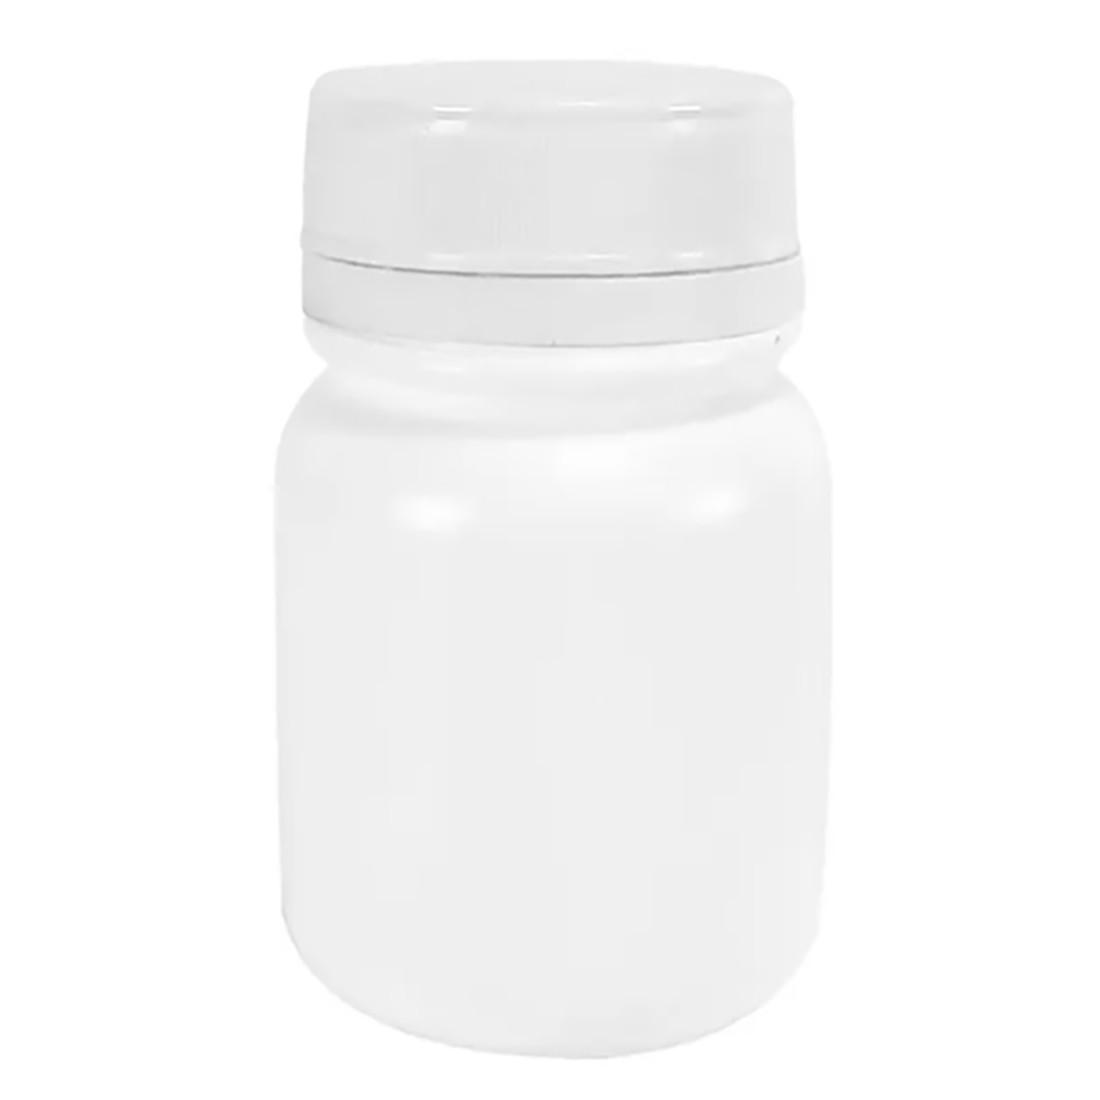 Pote Plástico para cápsula 120 ml Rosca Lacre kit com 100 unid